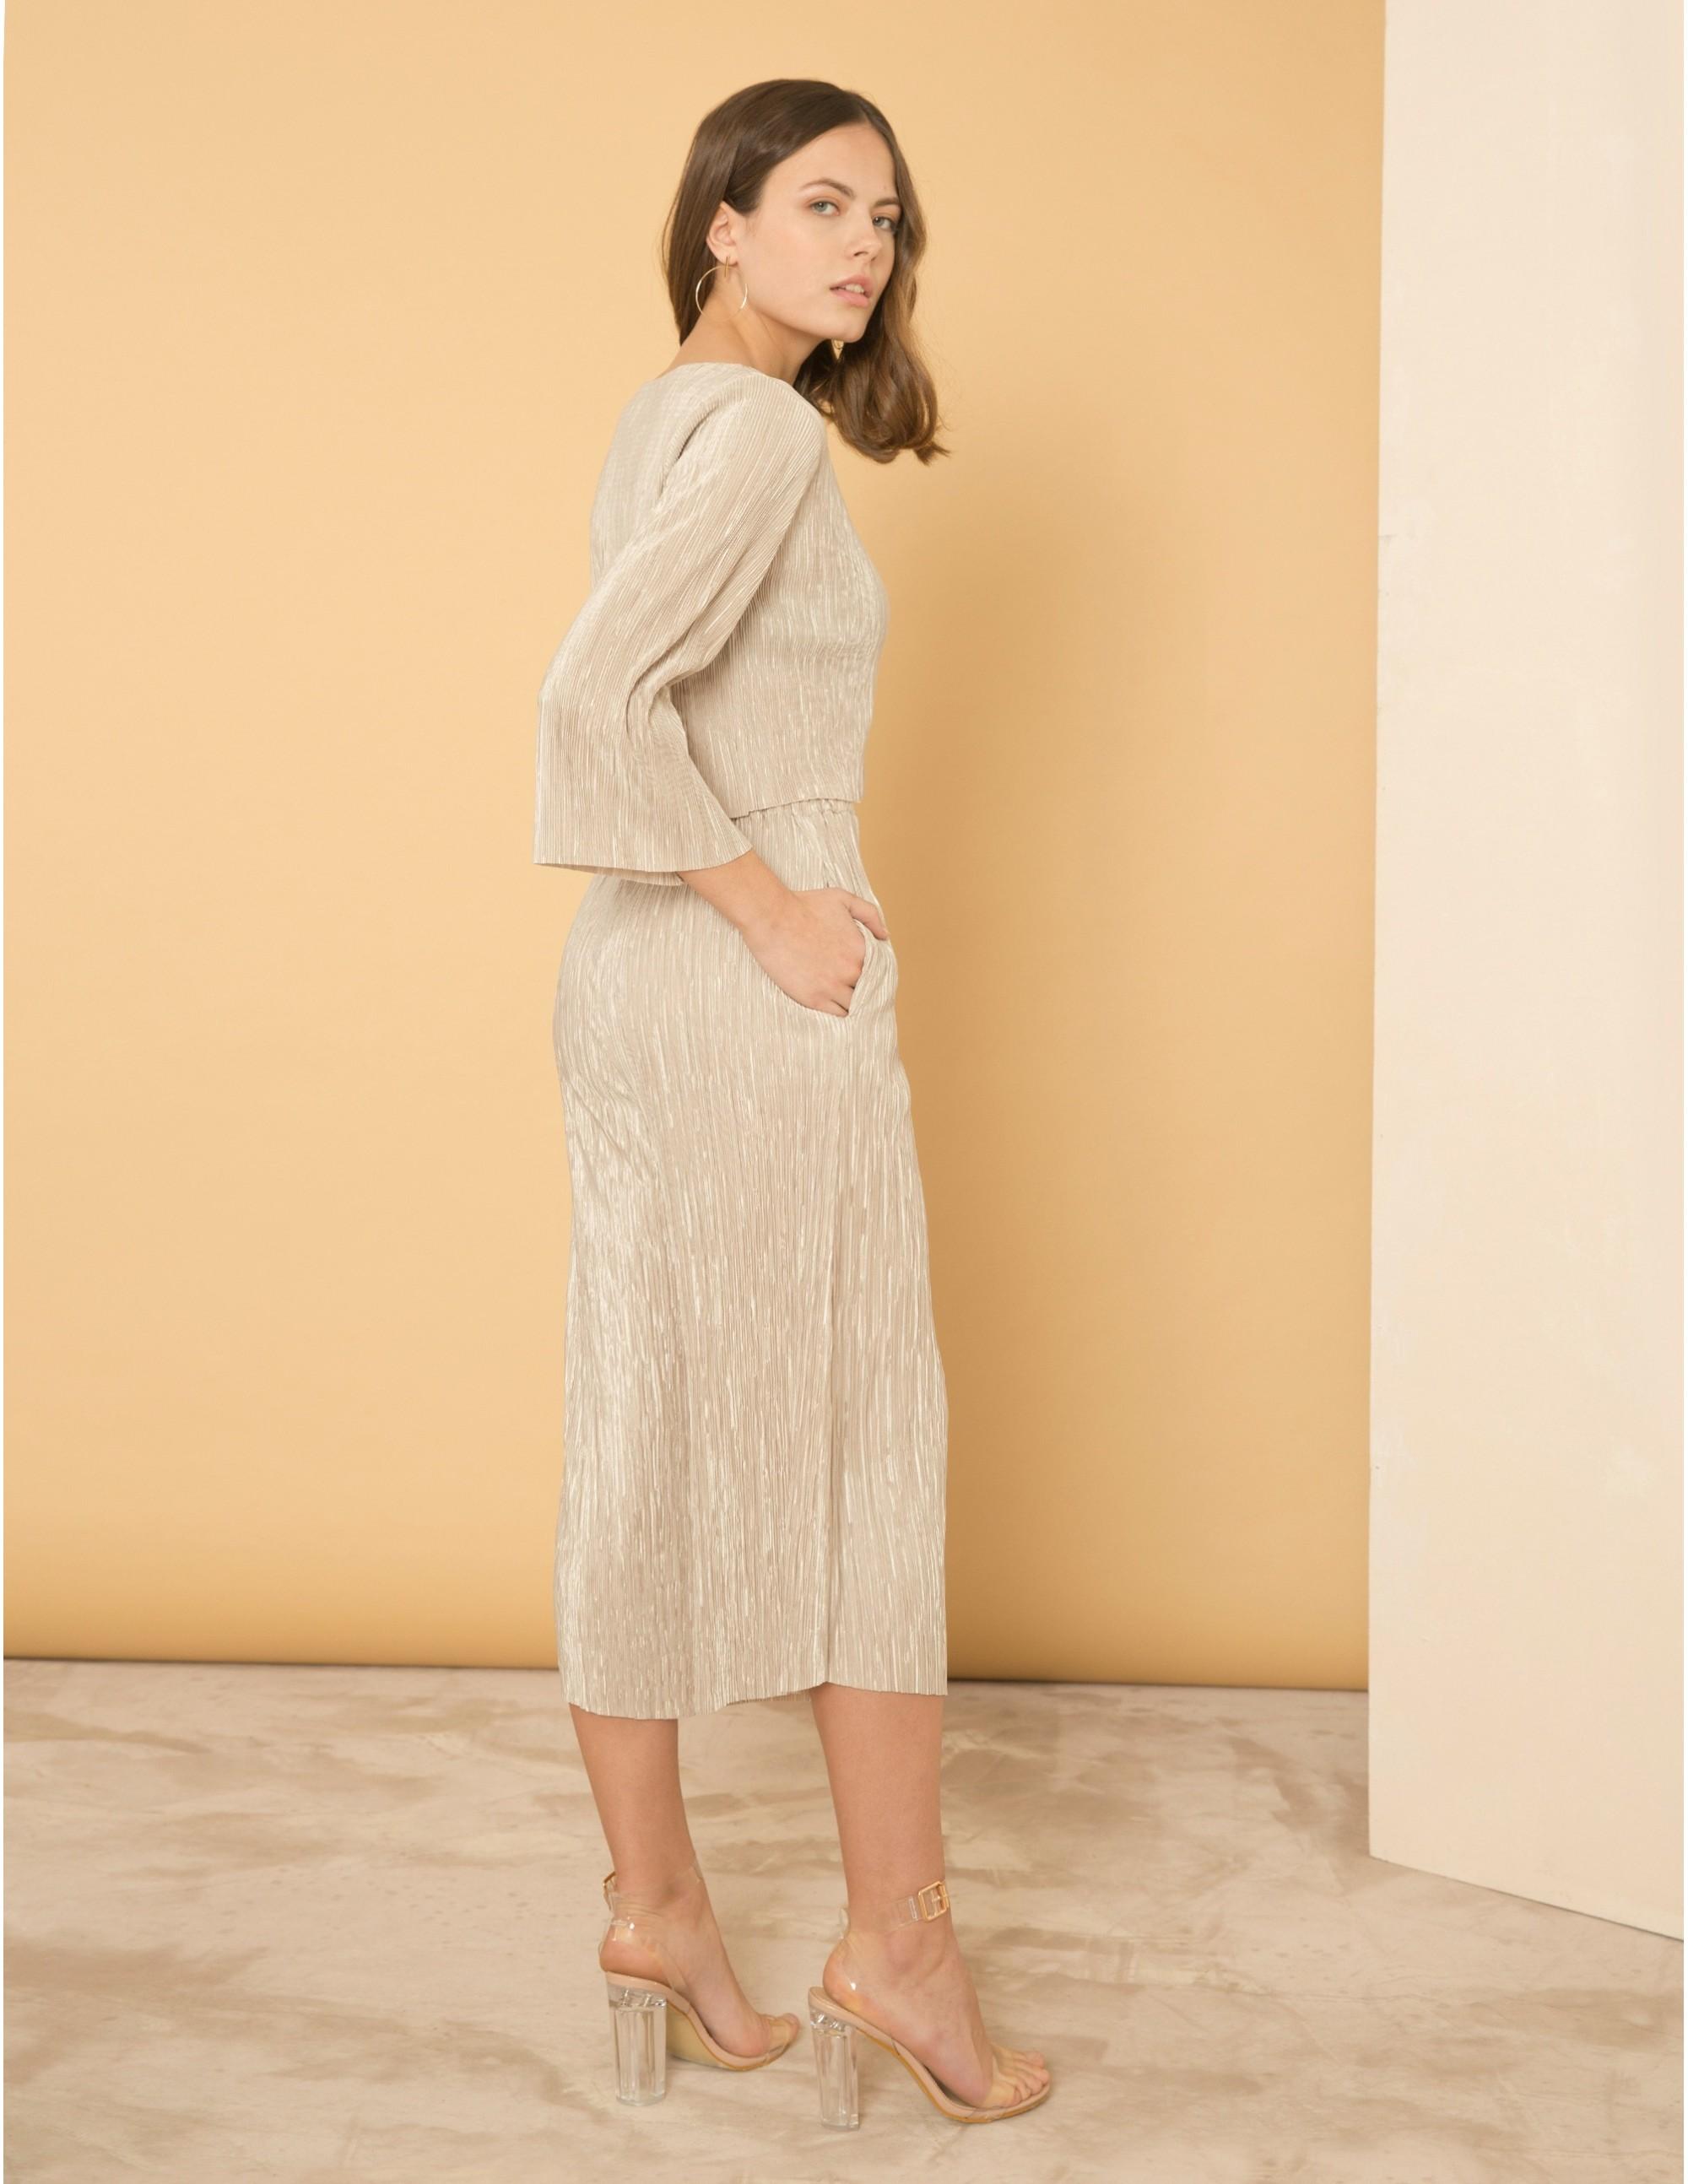 DISTRACTION pantalones - FULL MOON